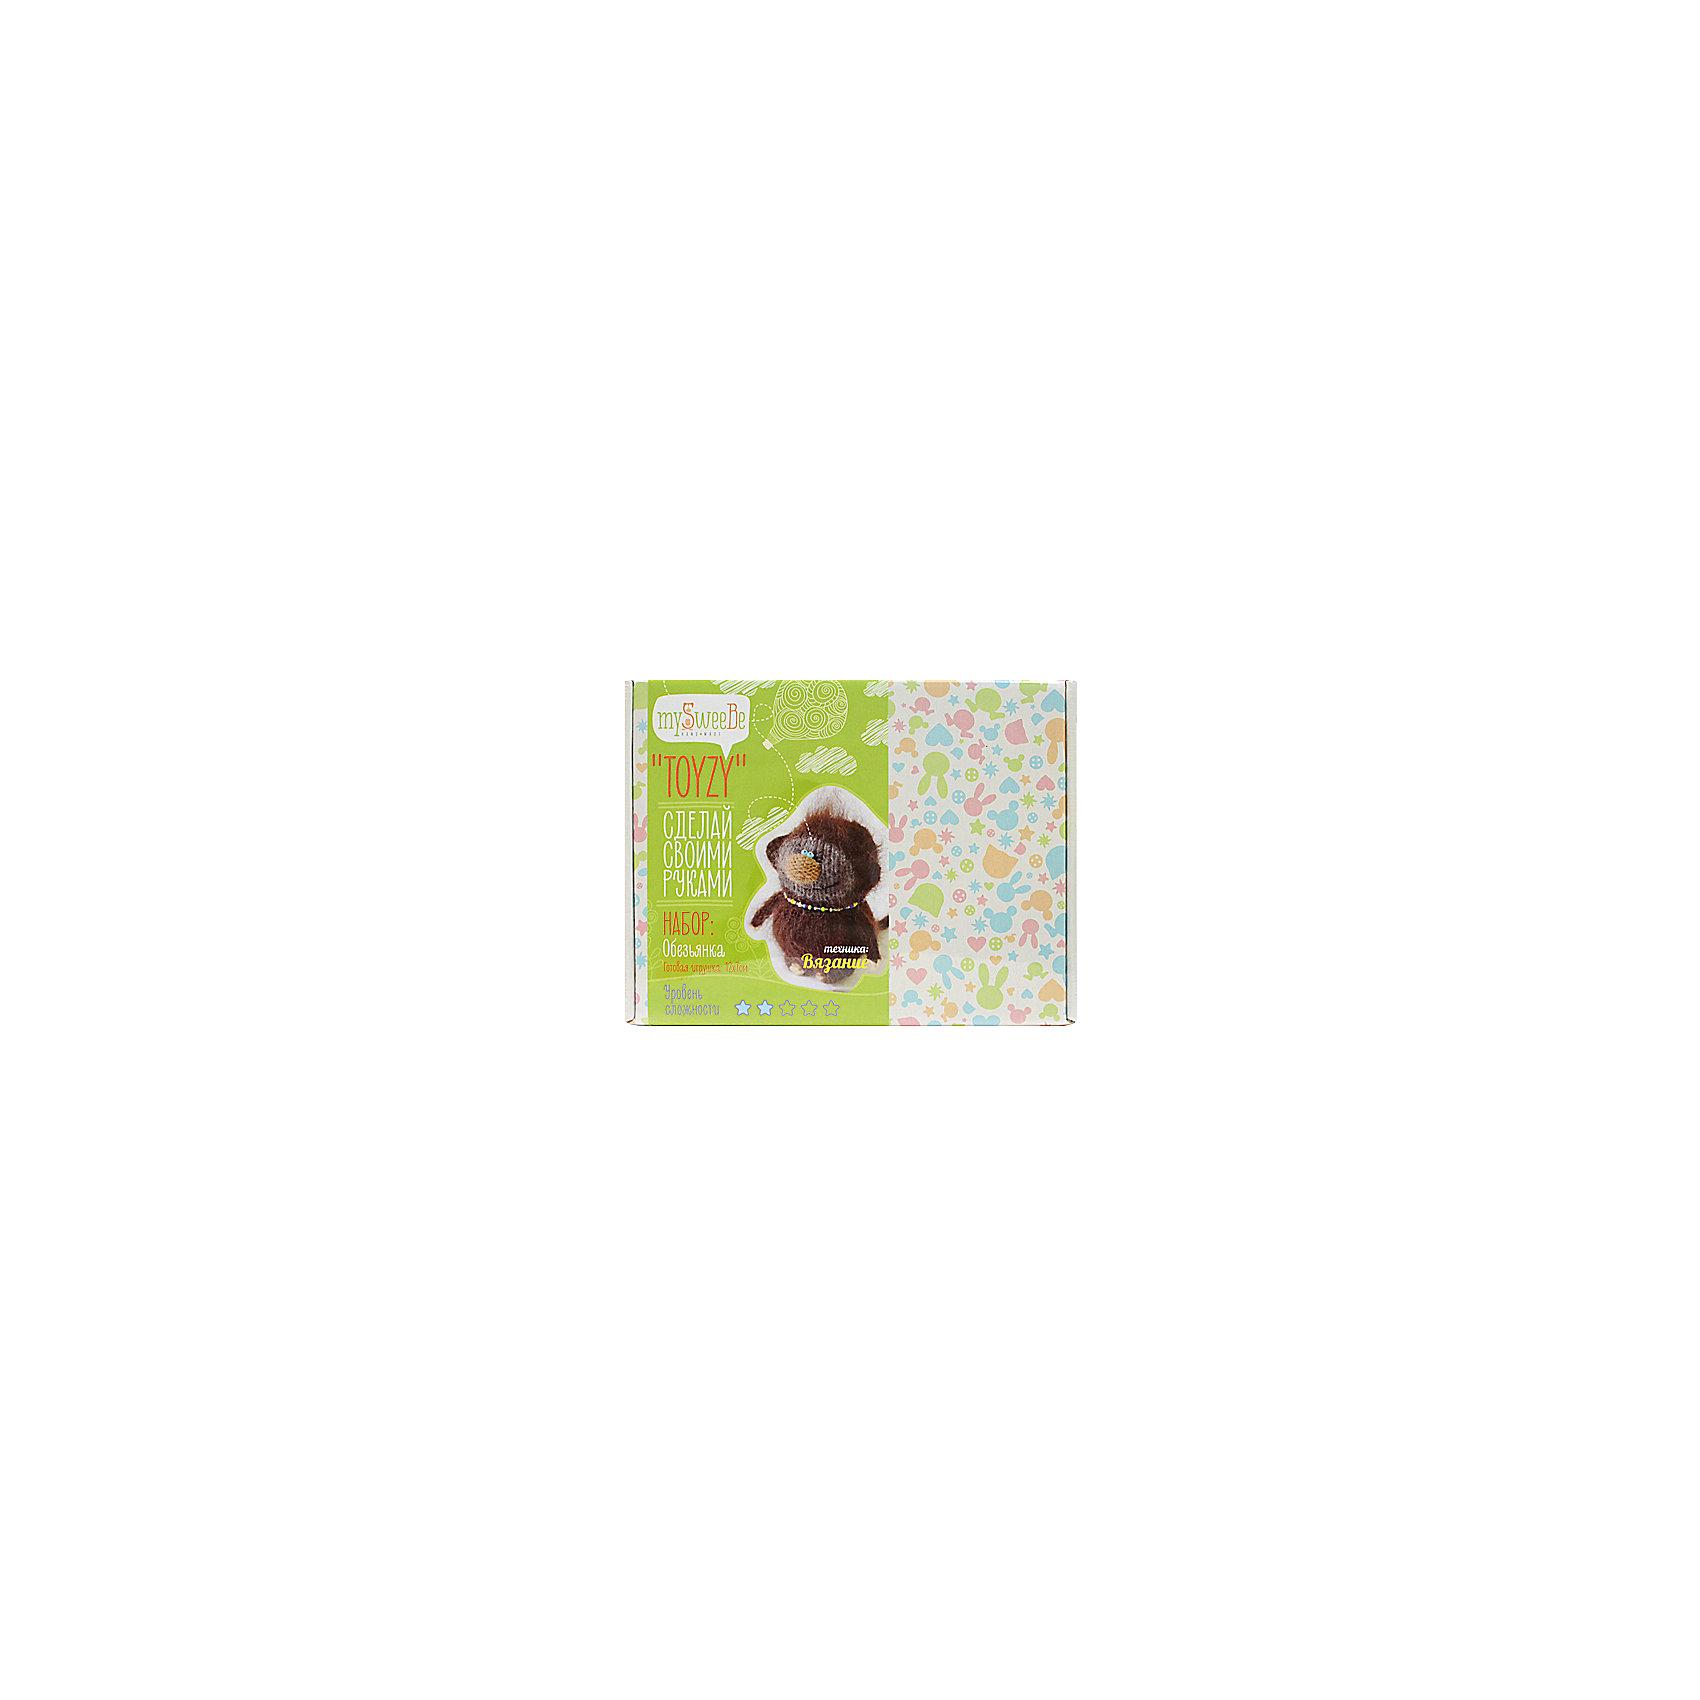 TOYZY Набор для вязания Обезьянка пряжа для вязания пехорка вискоза натуральная цвет камелия 125 400 м 100 г 5 шт